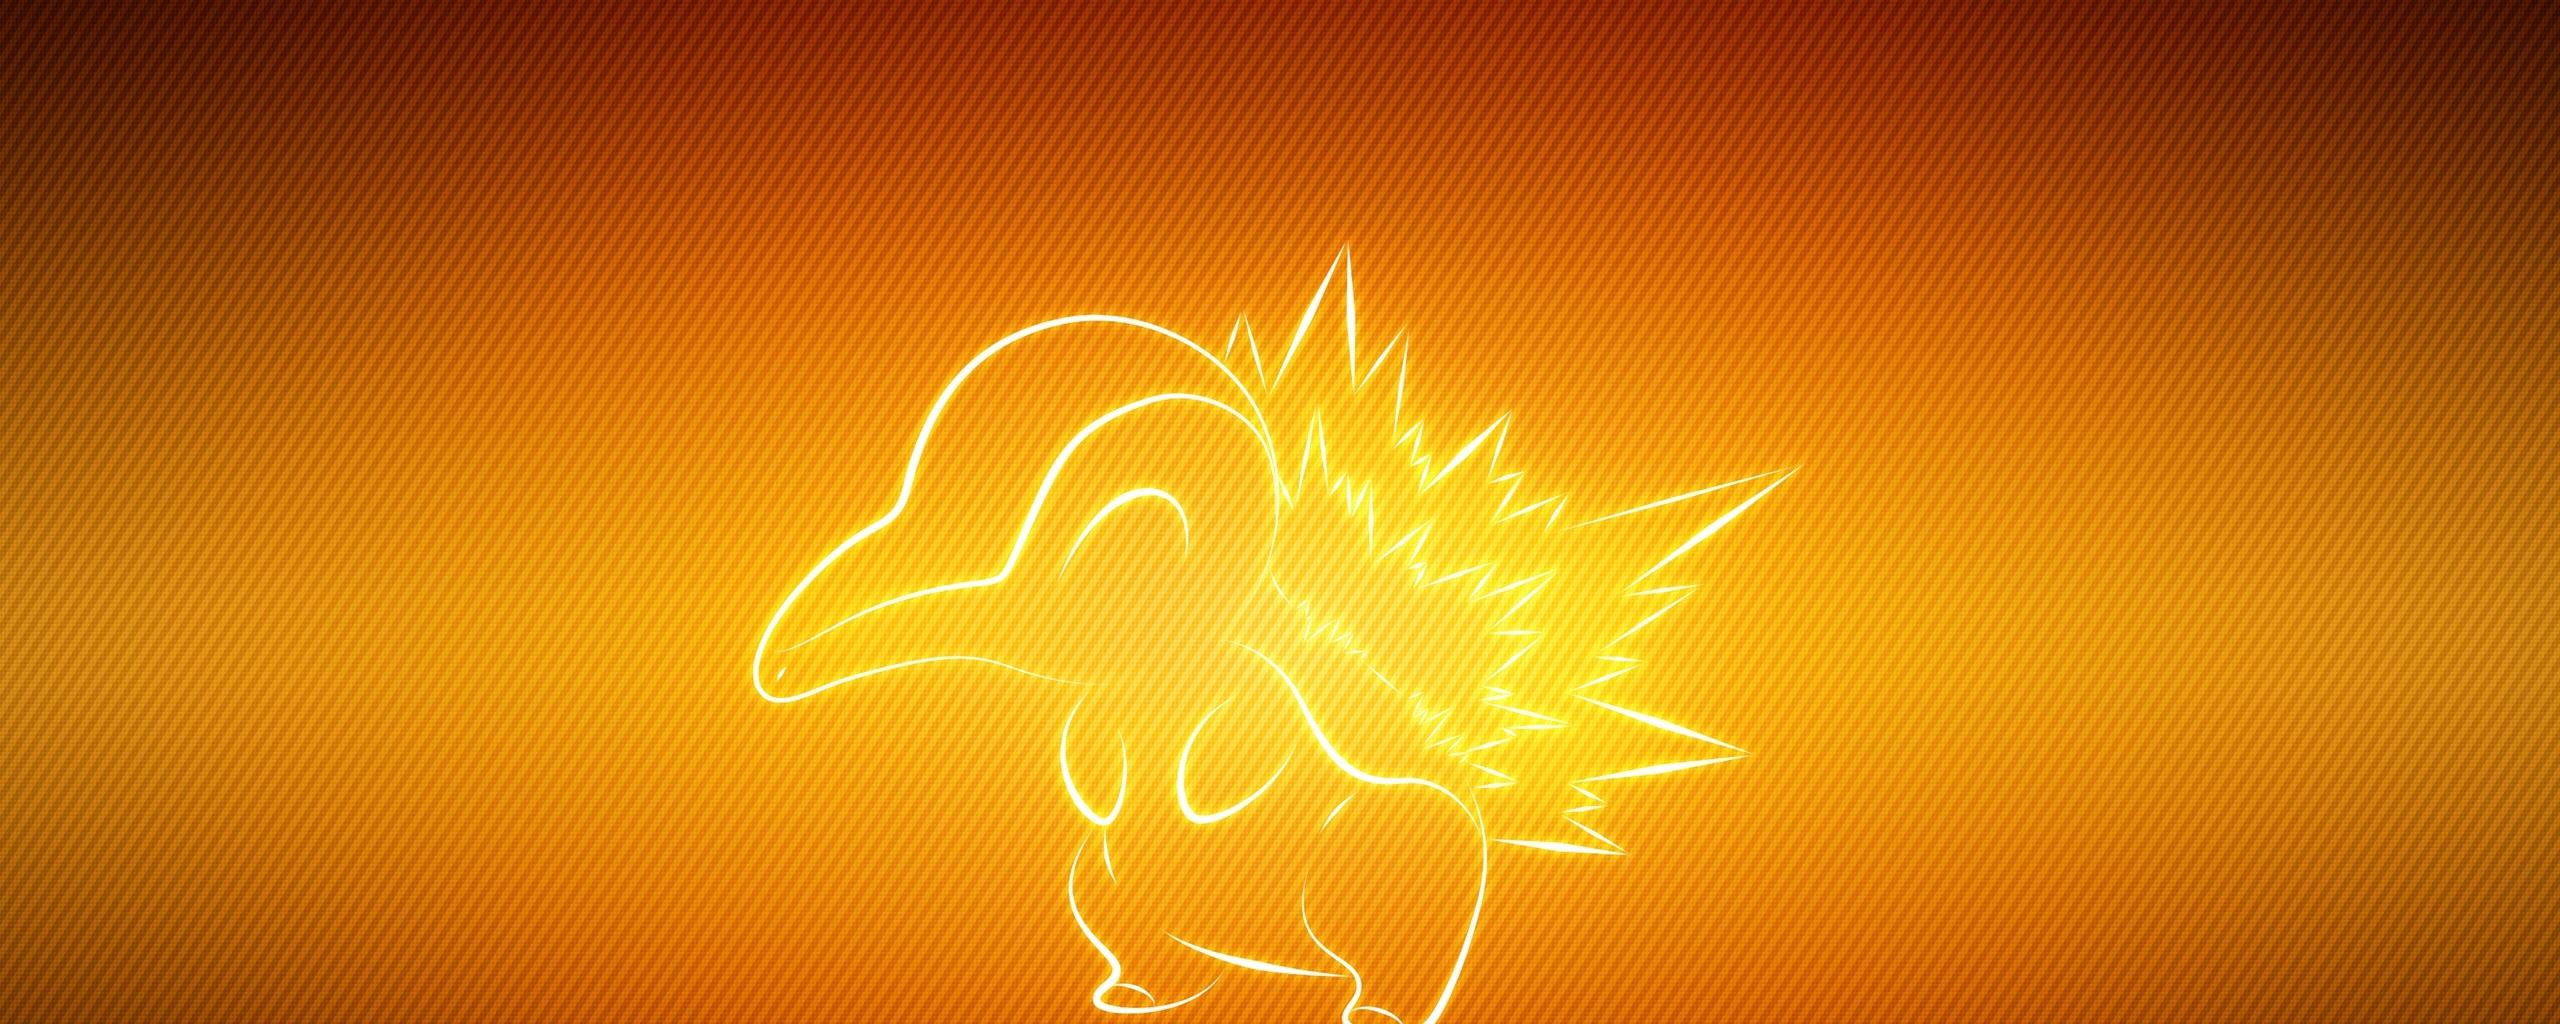 Pokemon Animal Cyndaquil Wallpaper Background Dual Monitor 2560x1024